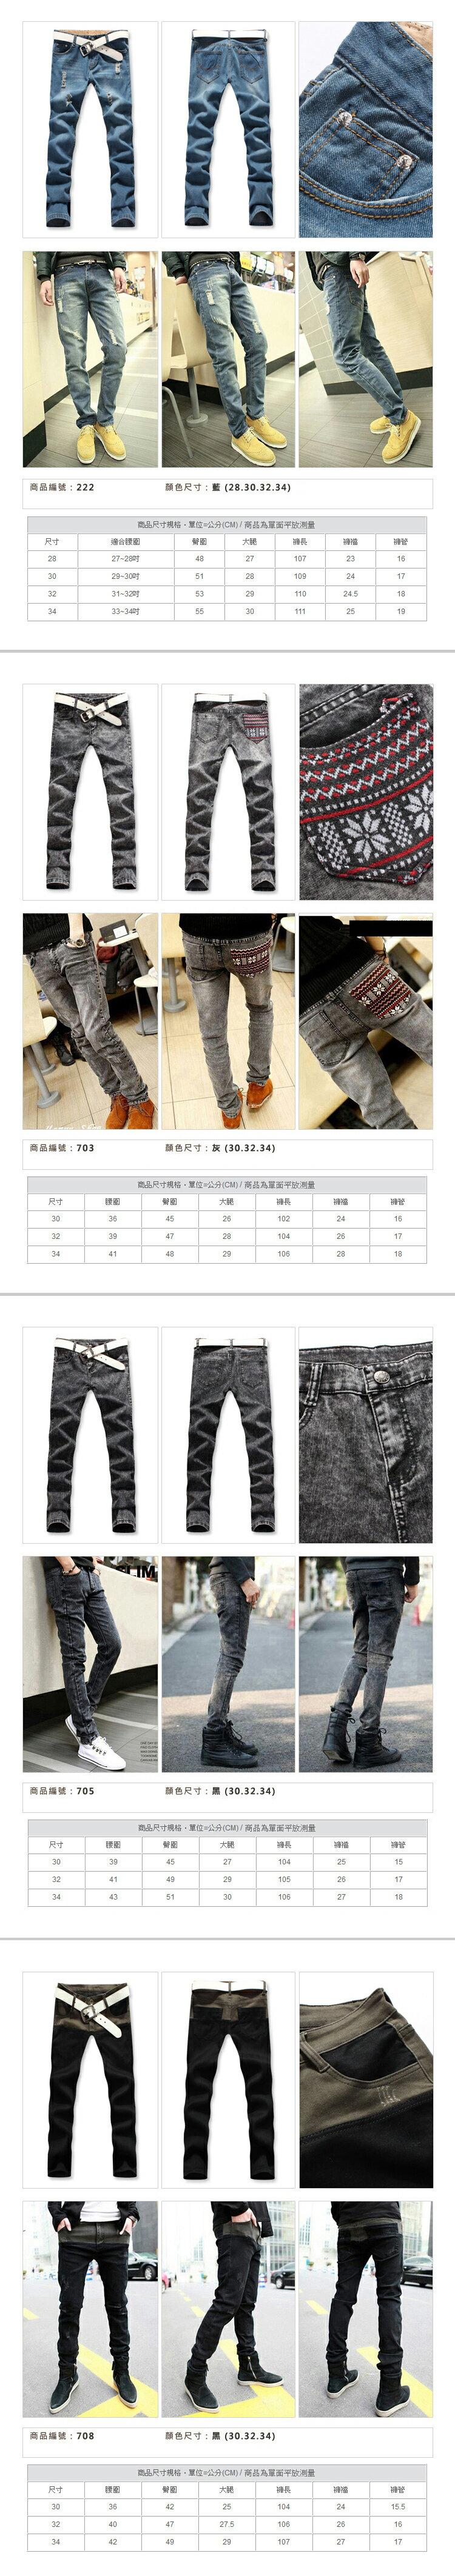 ☆BOY-2☆【NQLB399】丹寧潮流牛仔褲$399鬼洗/刷舊/素面 2